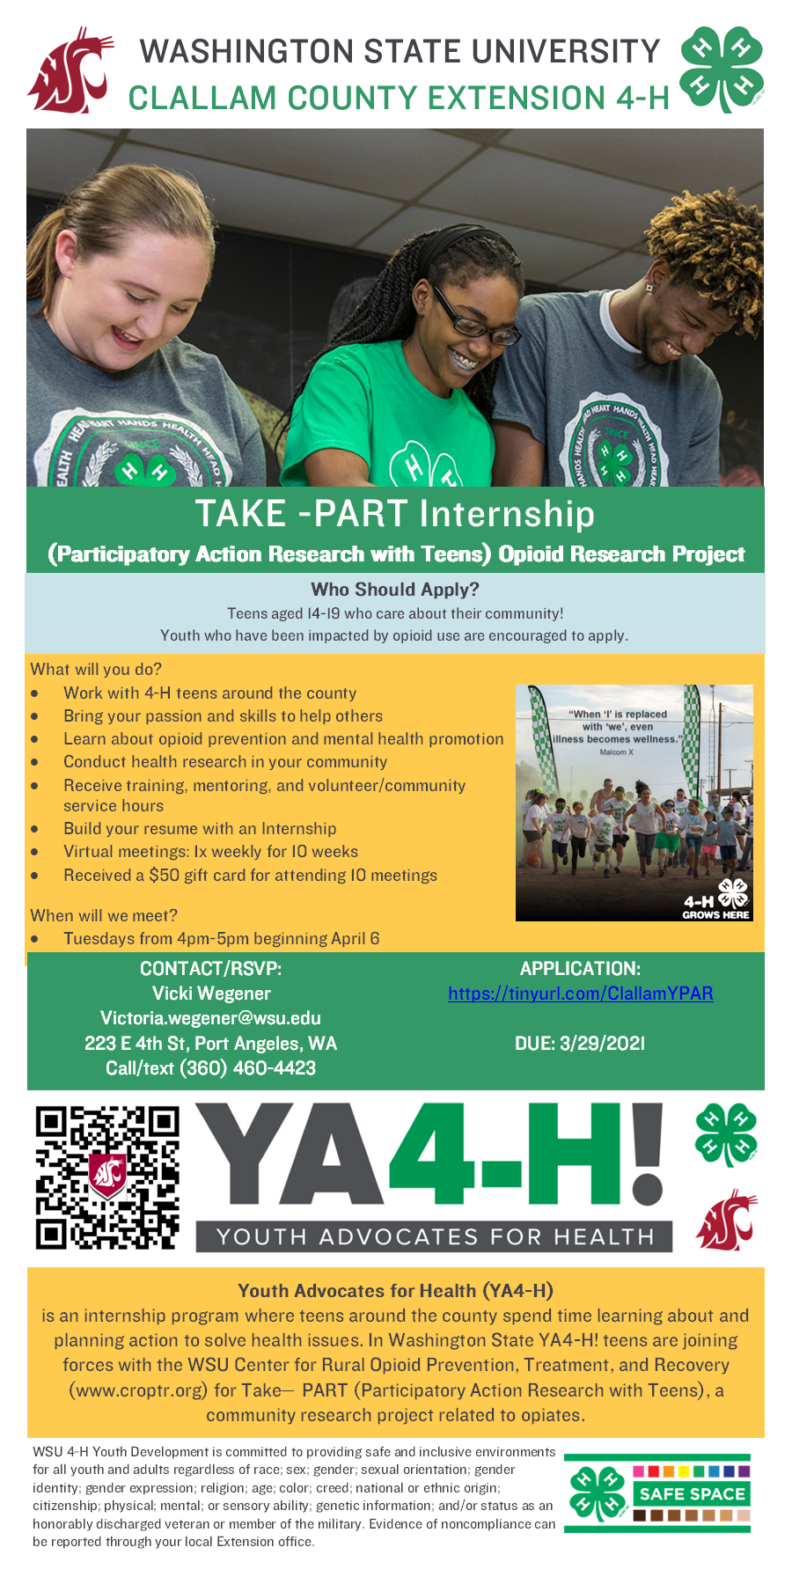 flyer describing YPAR program